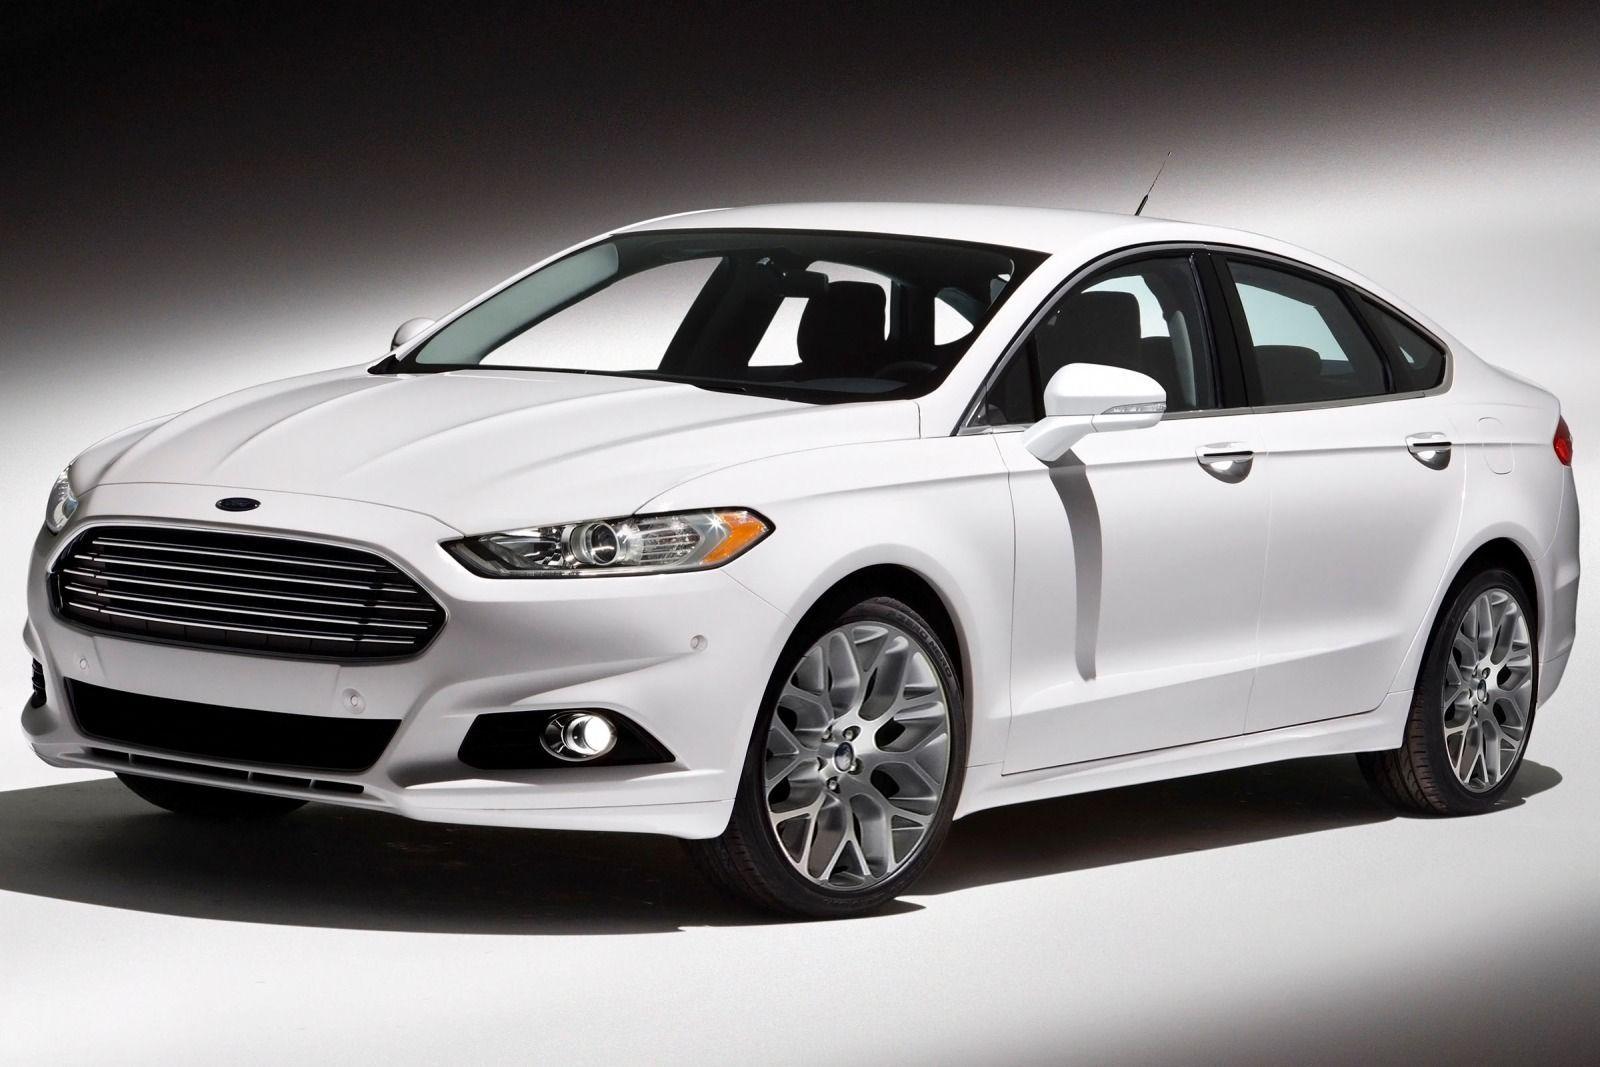 White Ford Fusion 2016 Wallpaper HD